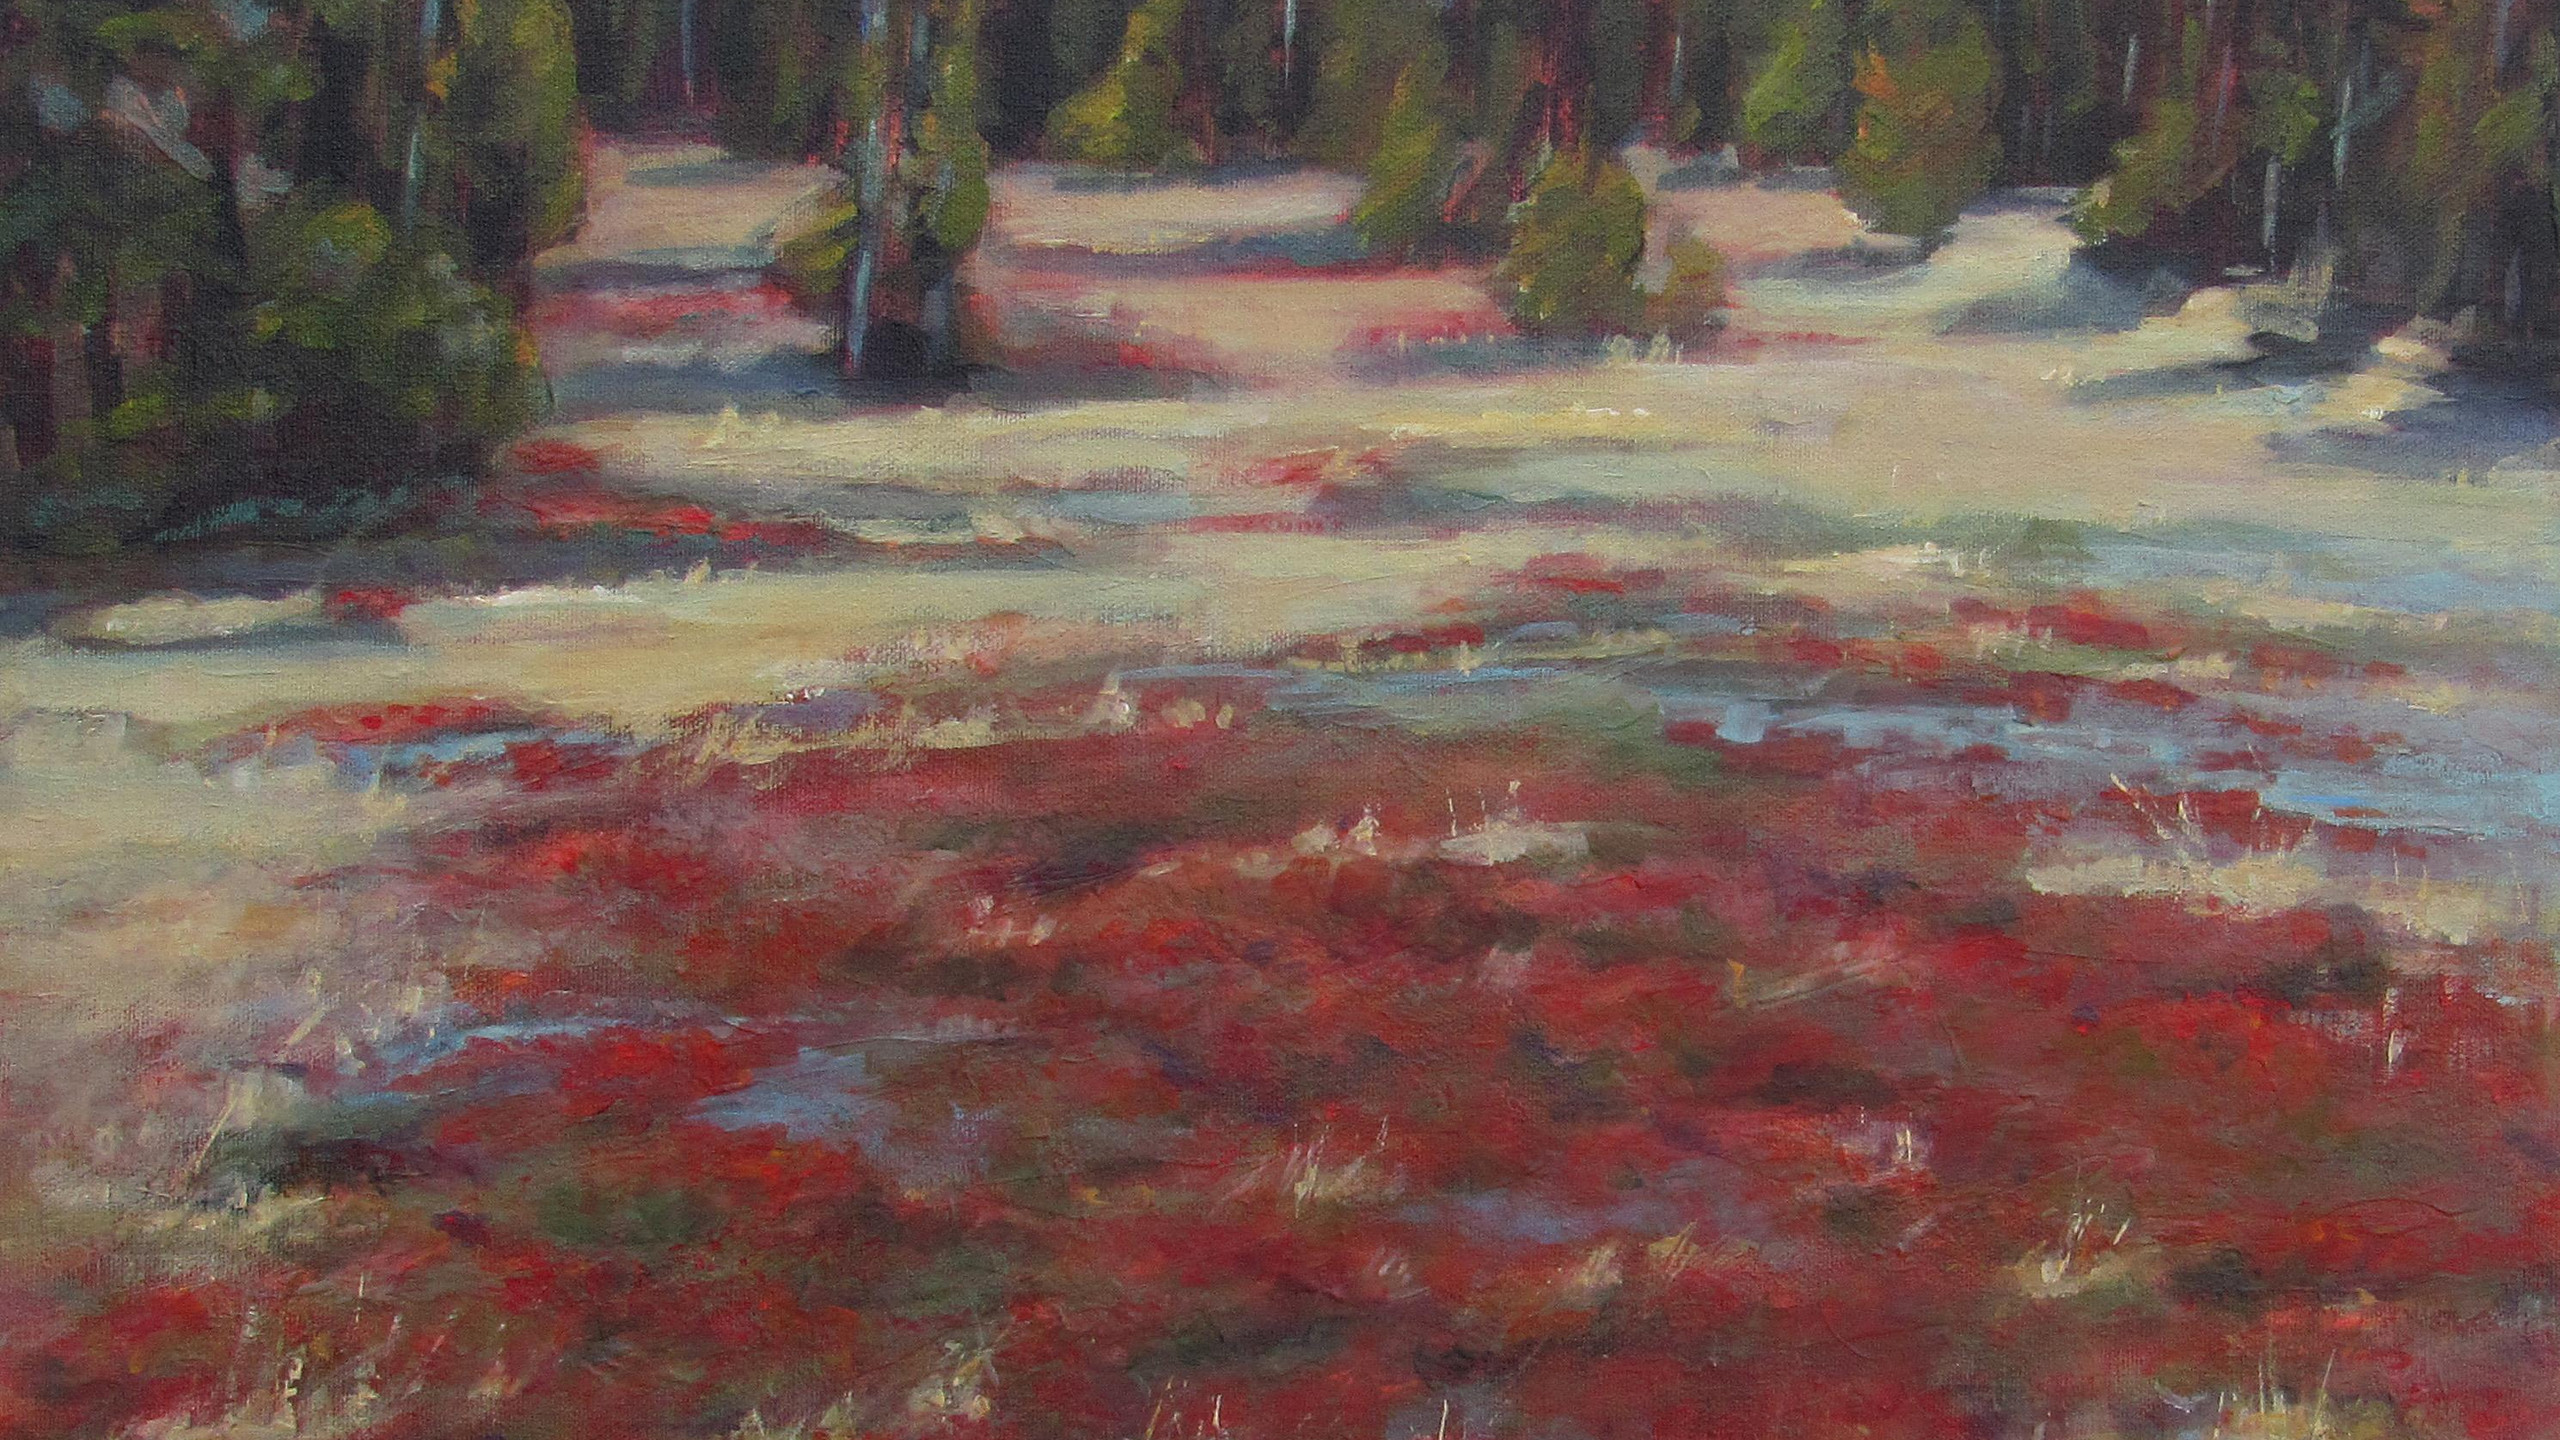 St Marie, Fay - Strathcona Park Meadow